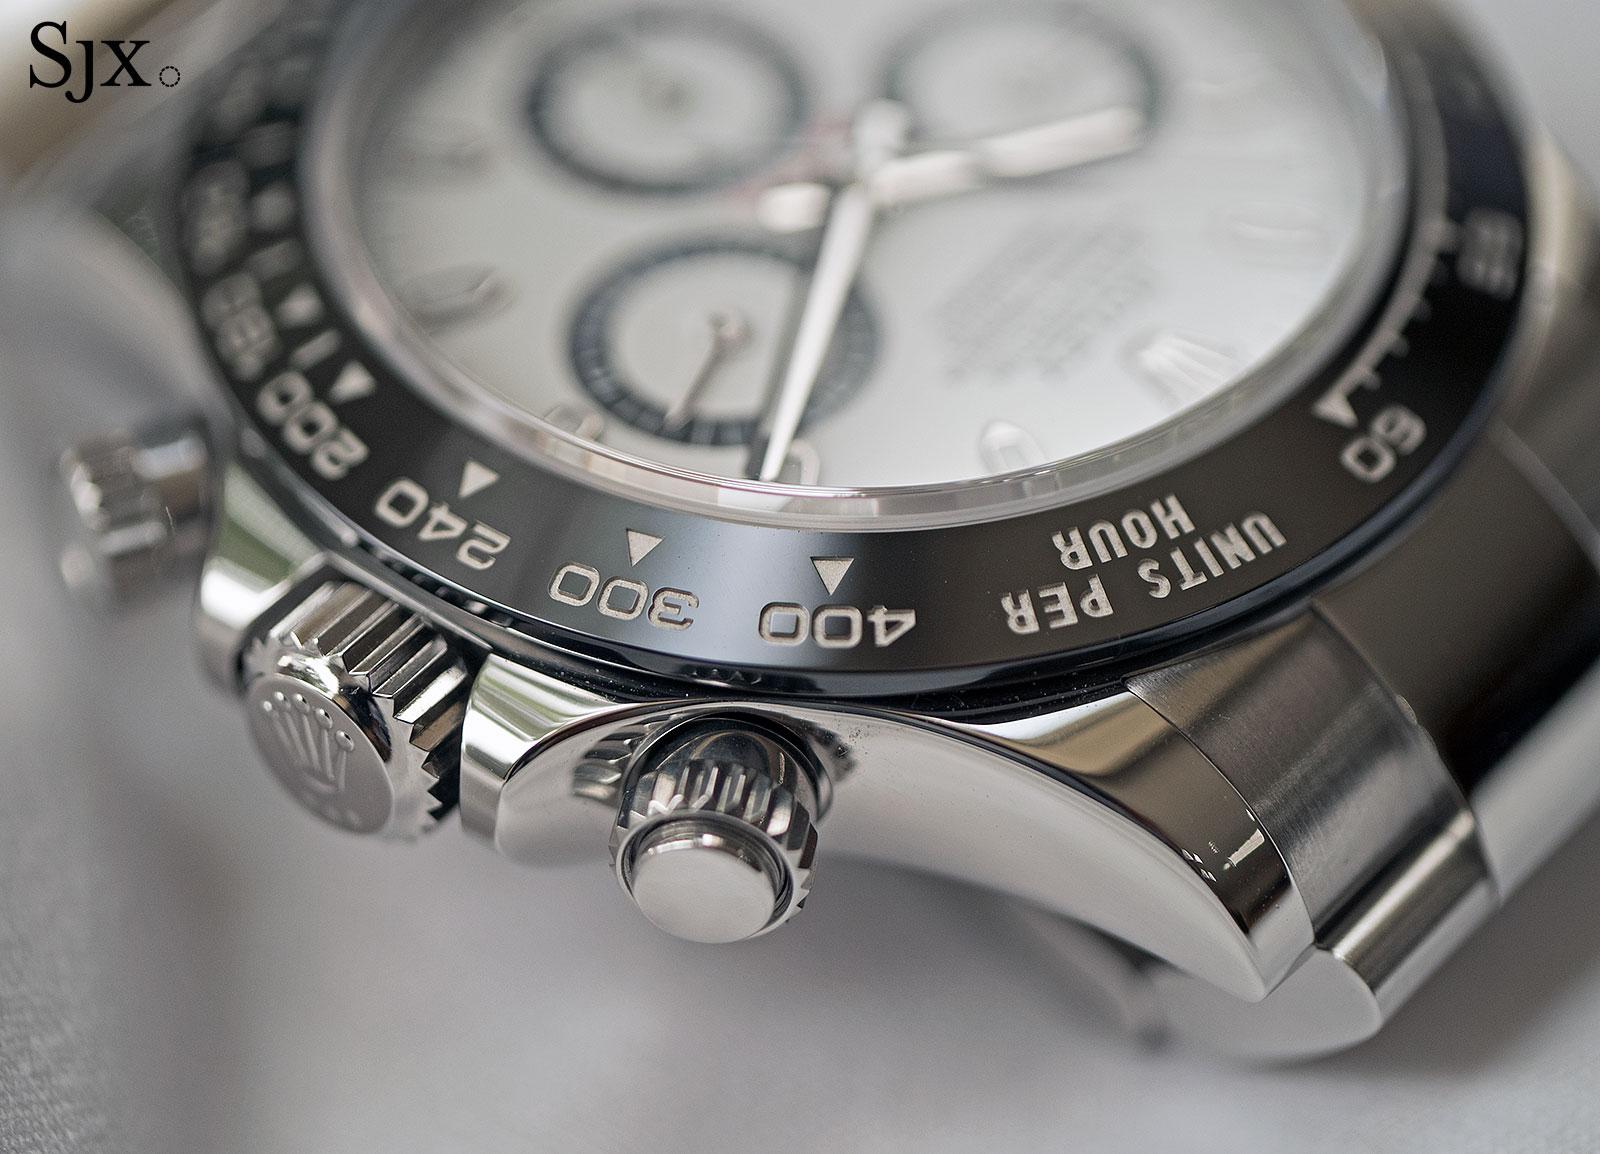 Rolex Daytona Ceramic White Dial 116500LN - 3